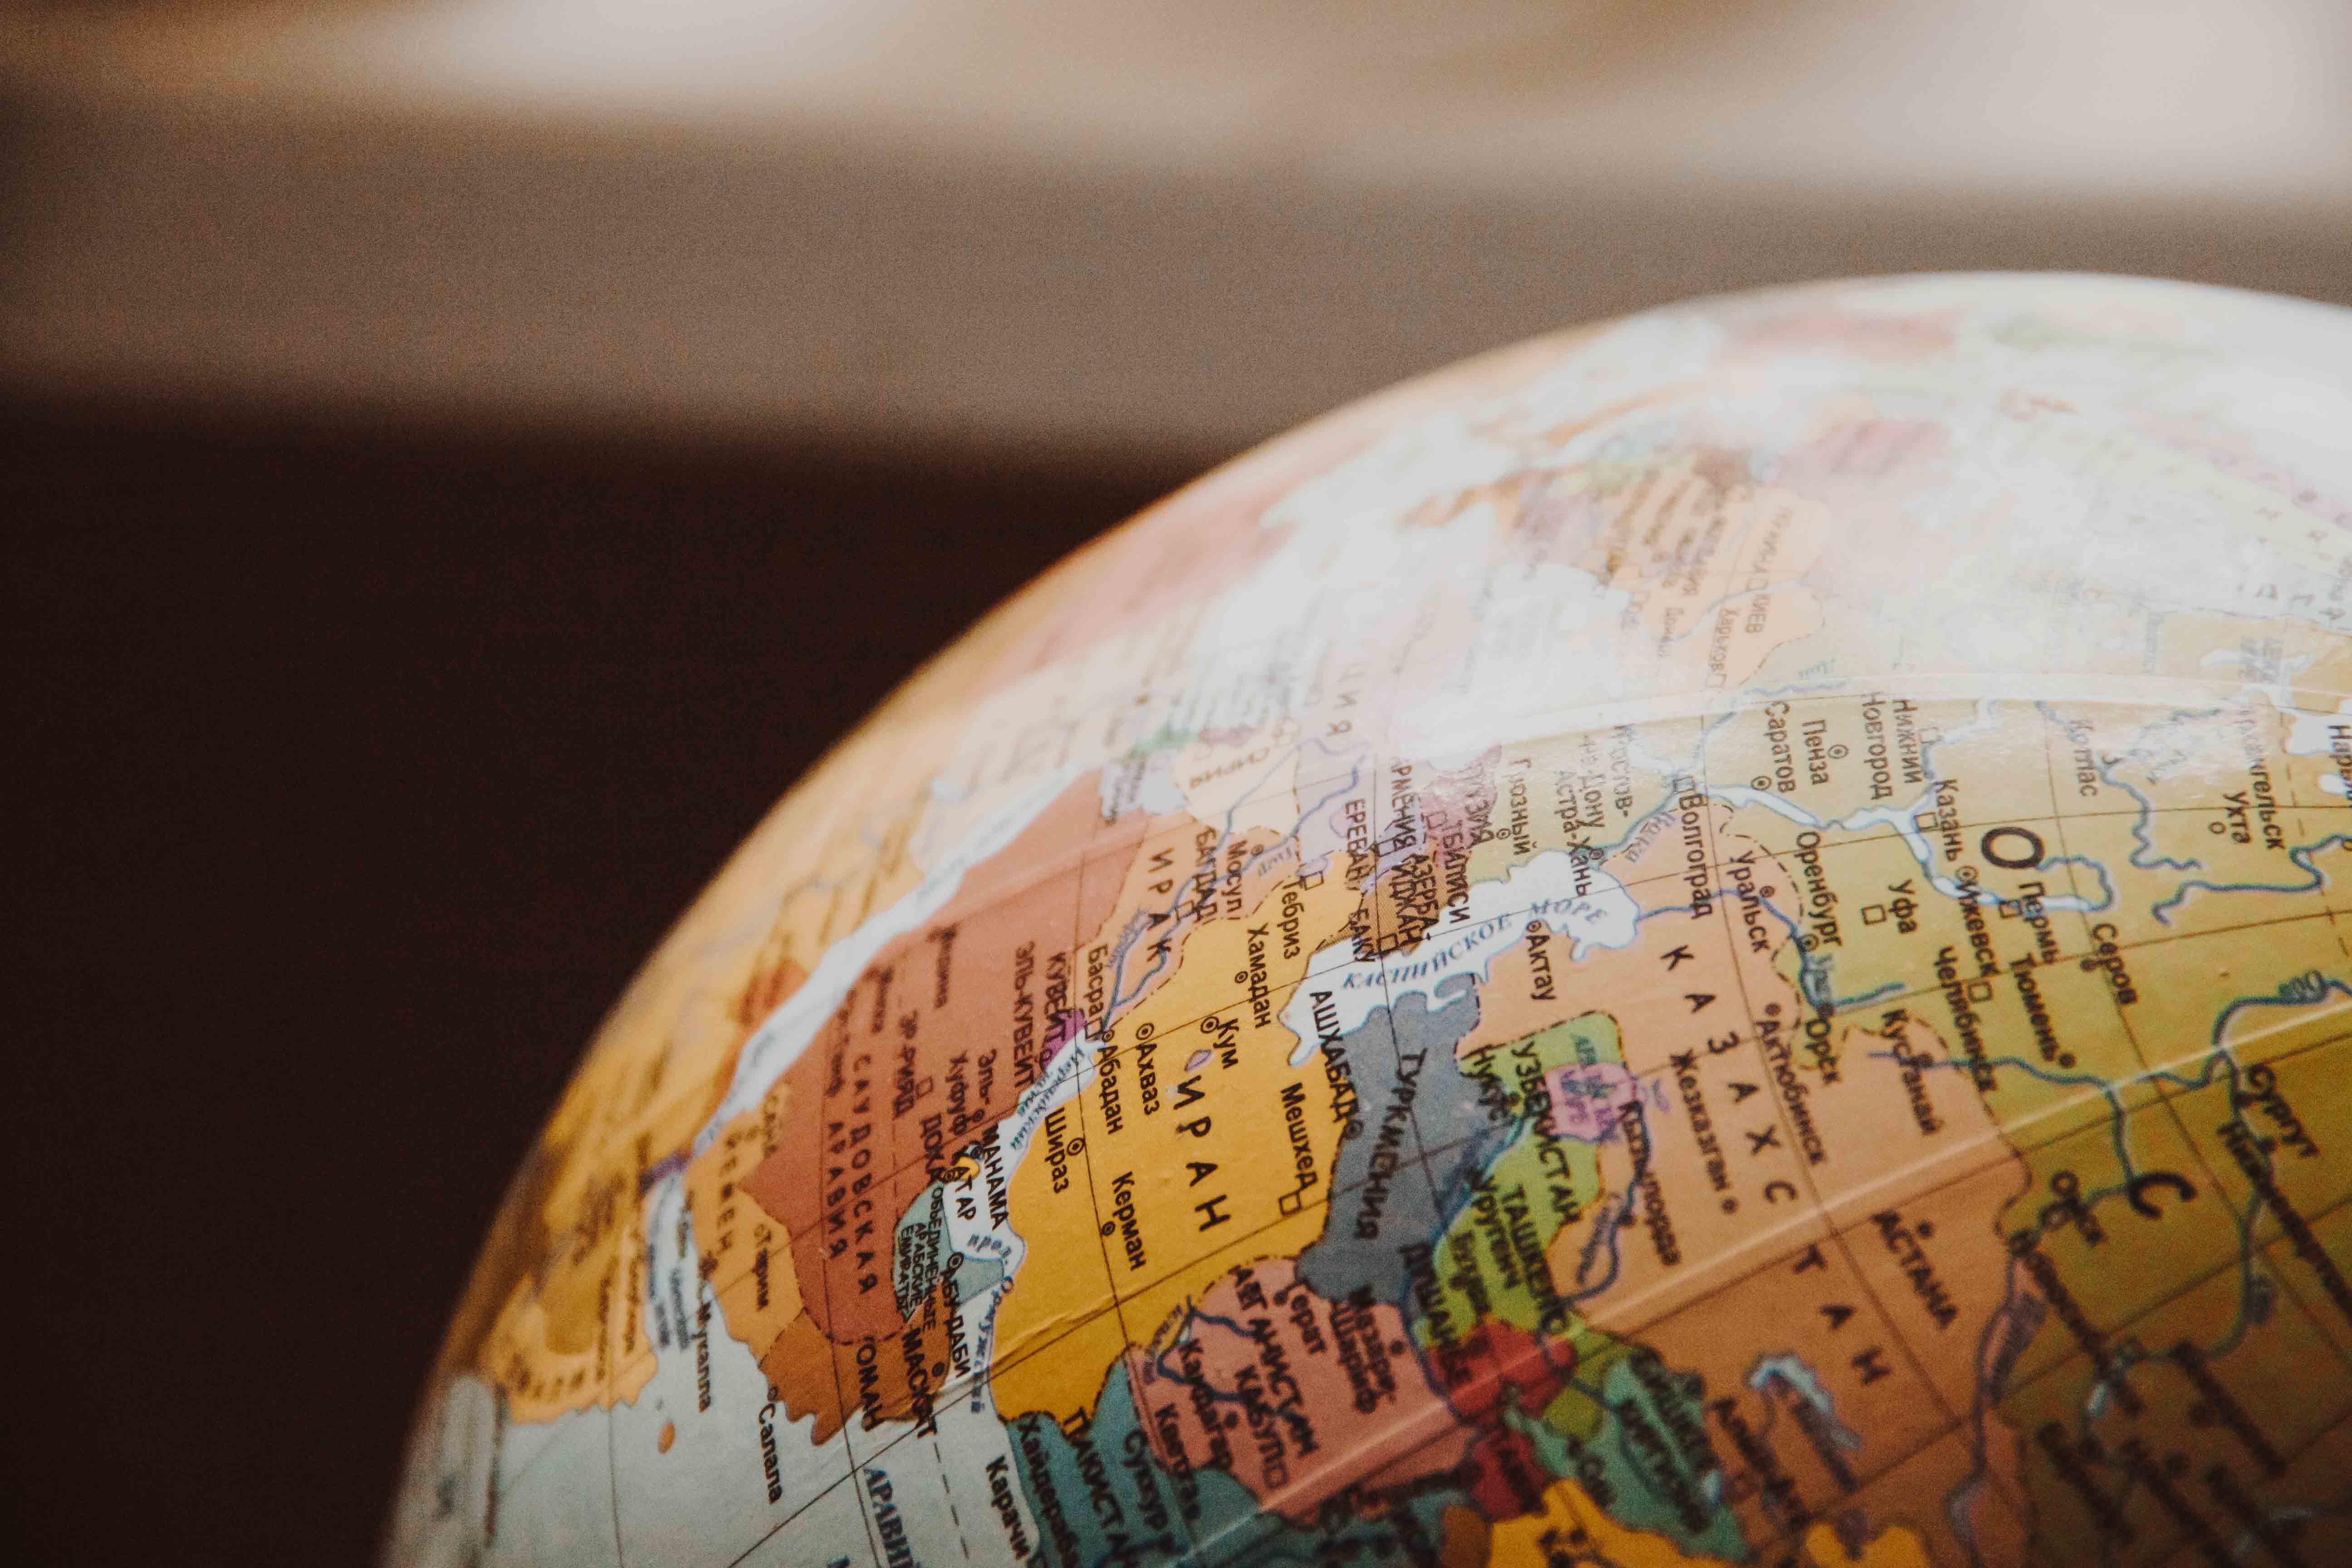 5. 1 dari 6 orang dunia merayakan Imlek